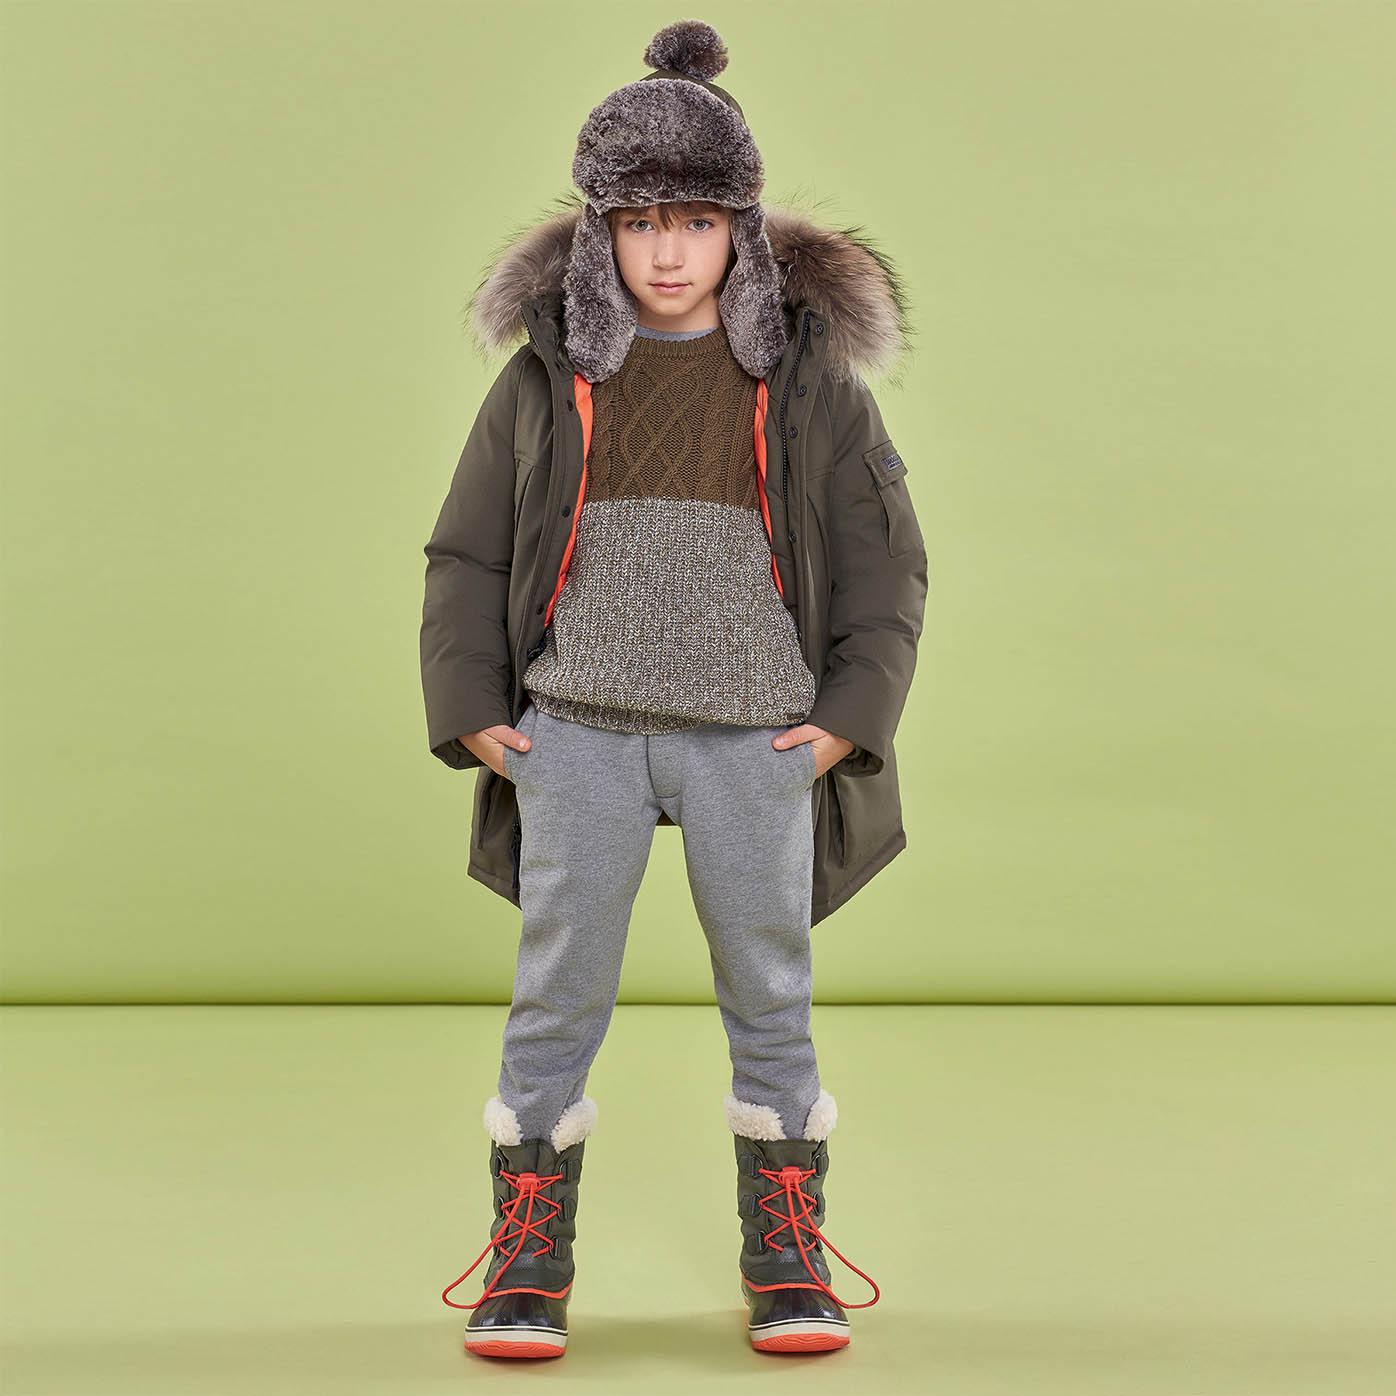 daafbf7de Kid's Collection Fall Winter 17 – Woolrich stories